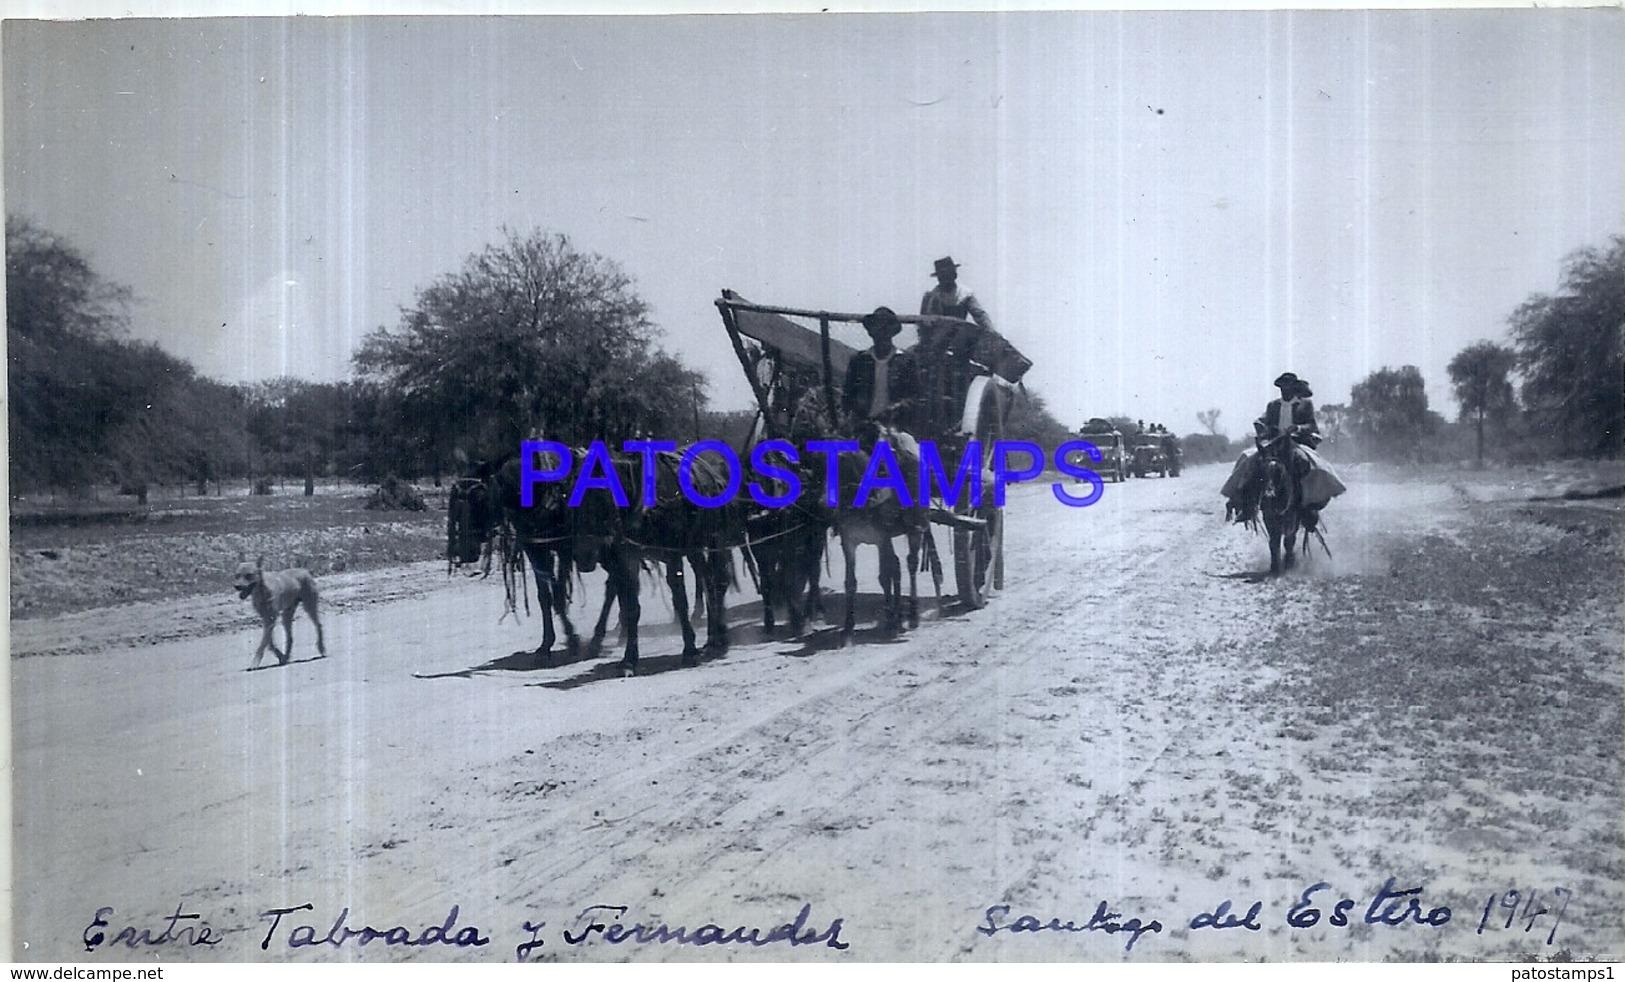 118471 ARGENTINA SANTIAGO DEL ESTERO VISTA PARCIAL CART A HORSE & AUTOMOBILE CAR AÑO 1947 16.5 X 10 CM PHOTO NO POSTCARD - Fotografie